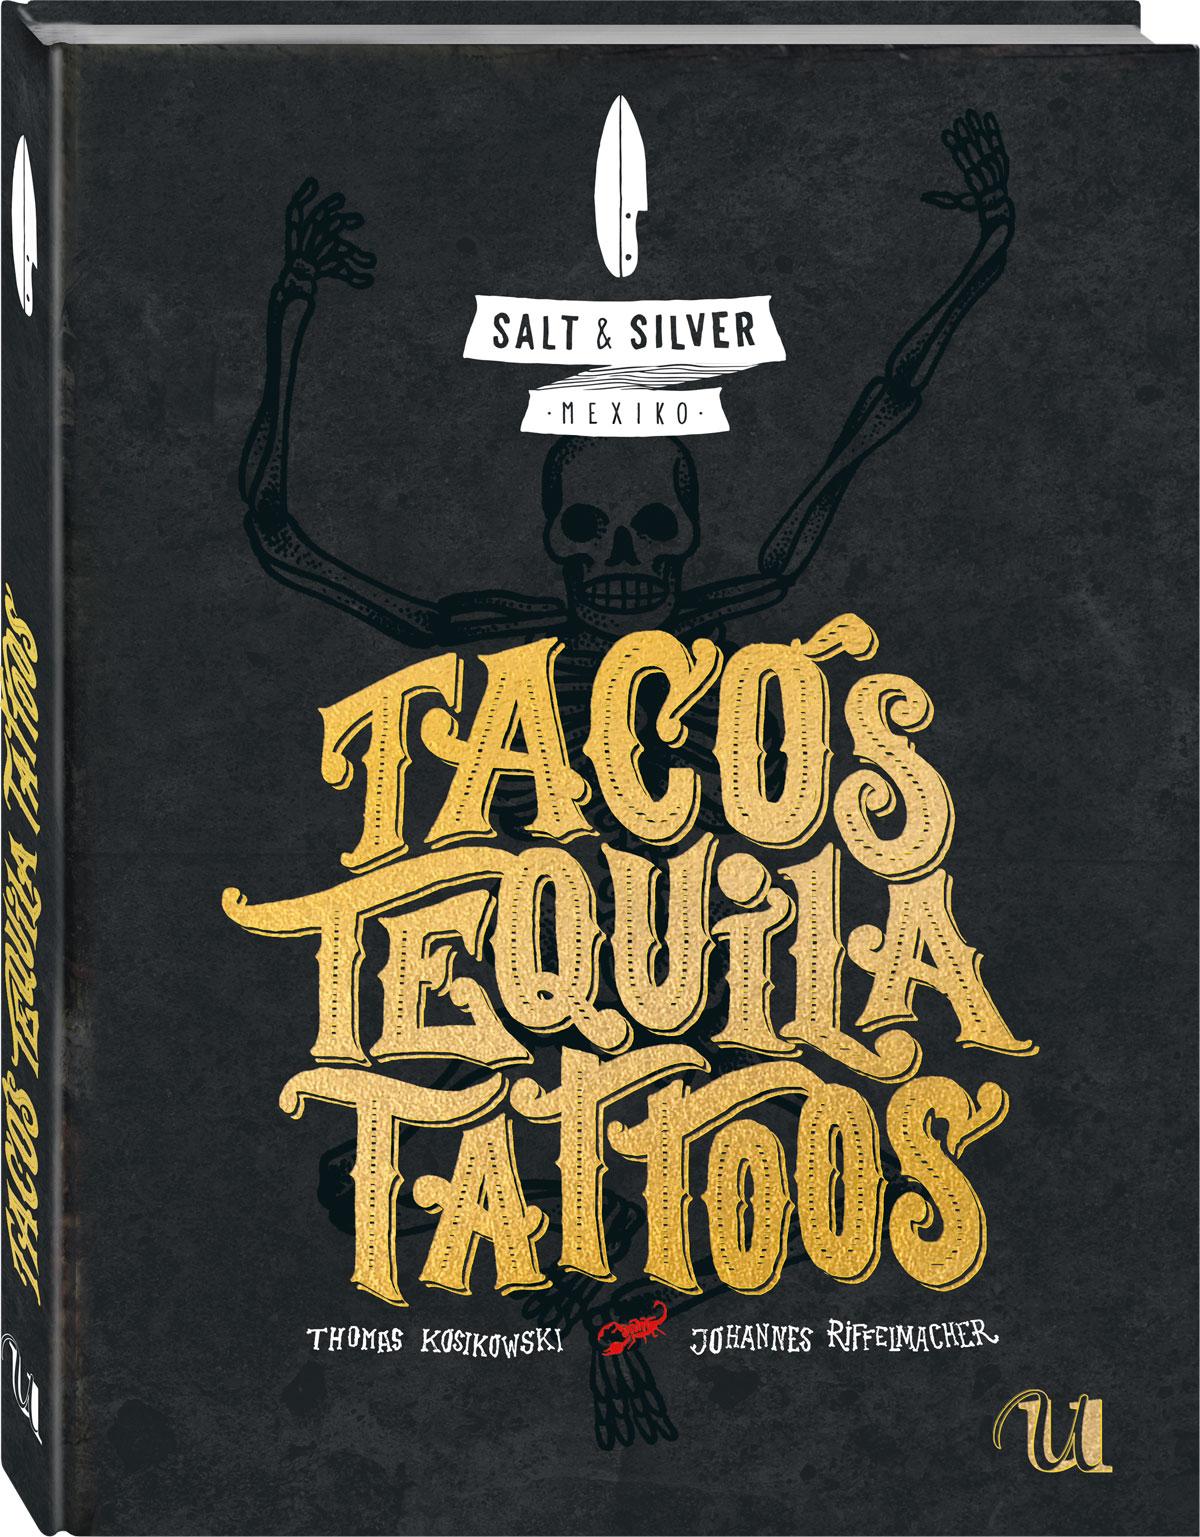 Salt & Silver Mexiko. Tacos, Tequila, Tattoos, Johannes Riffelmacher